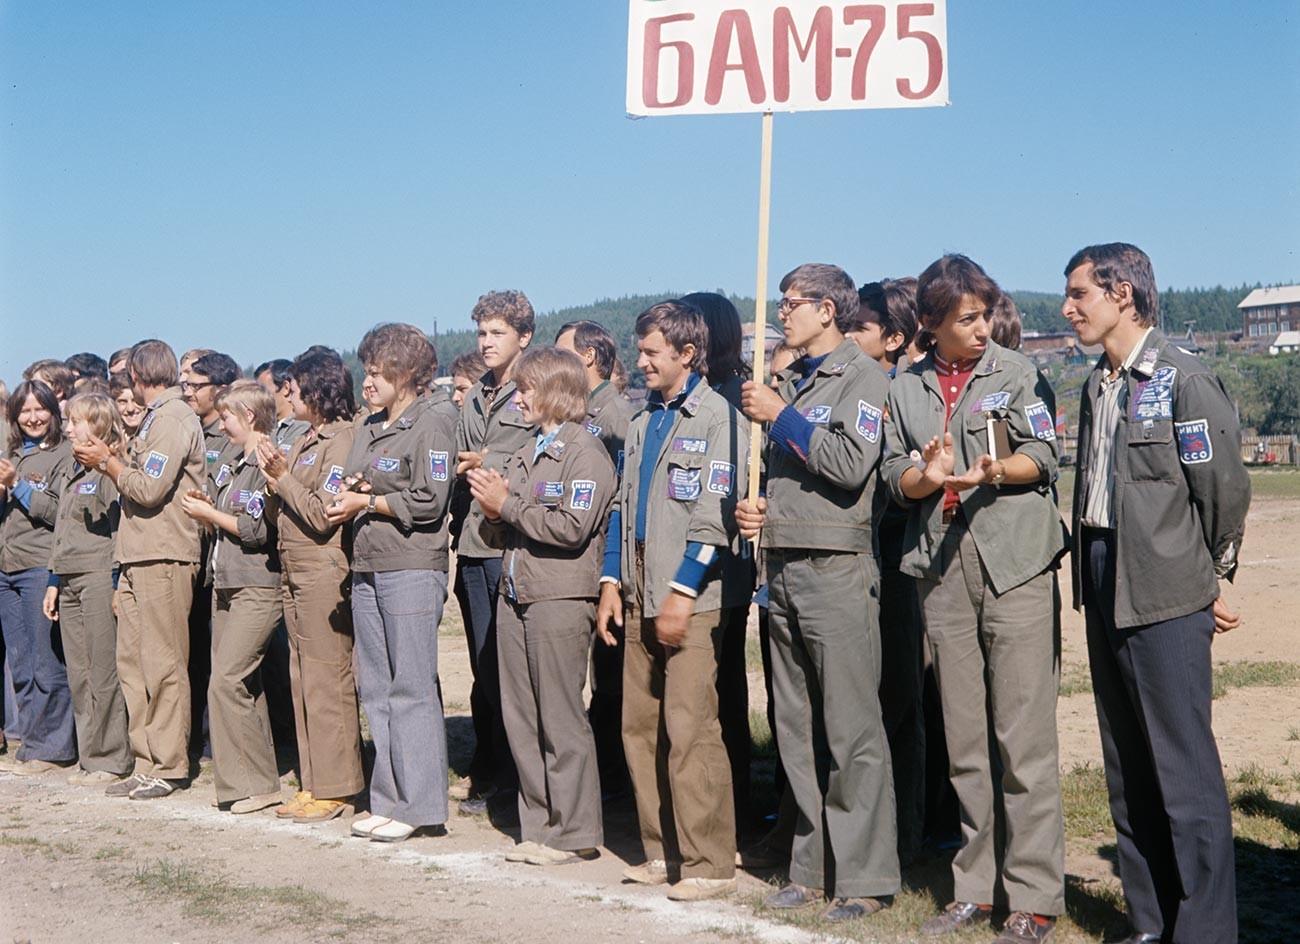 Komsomol members at the Baikal–Amur Mainline